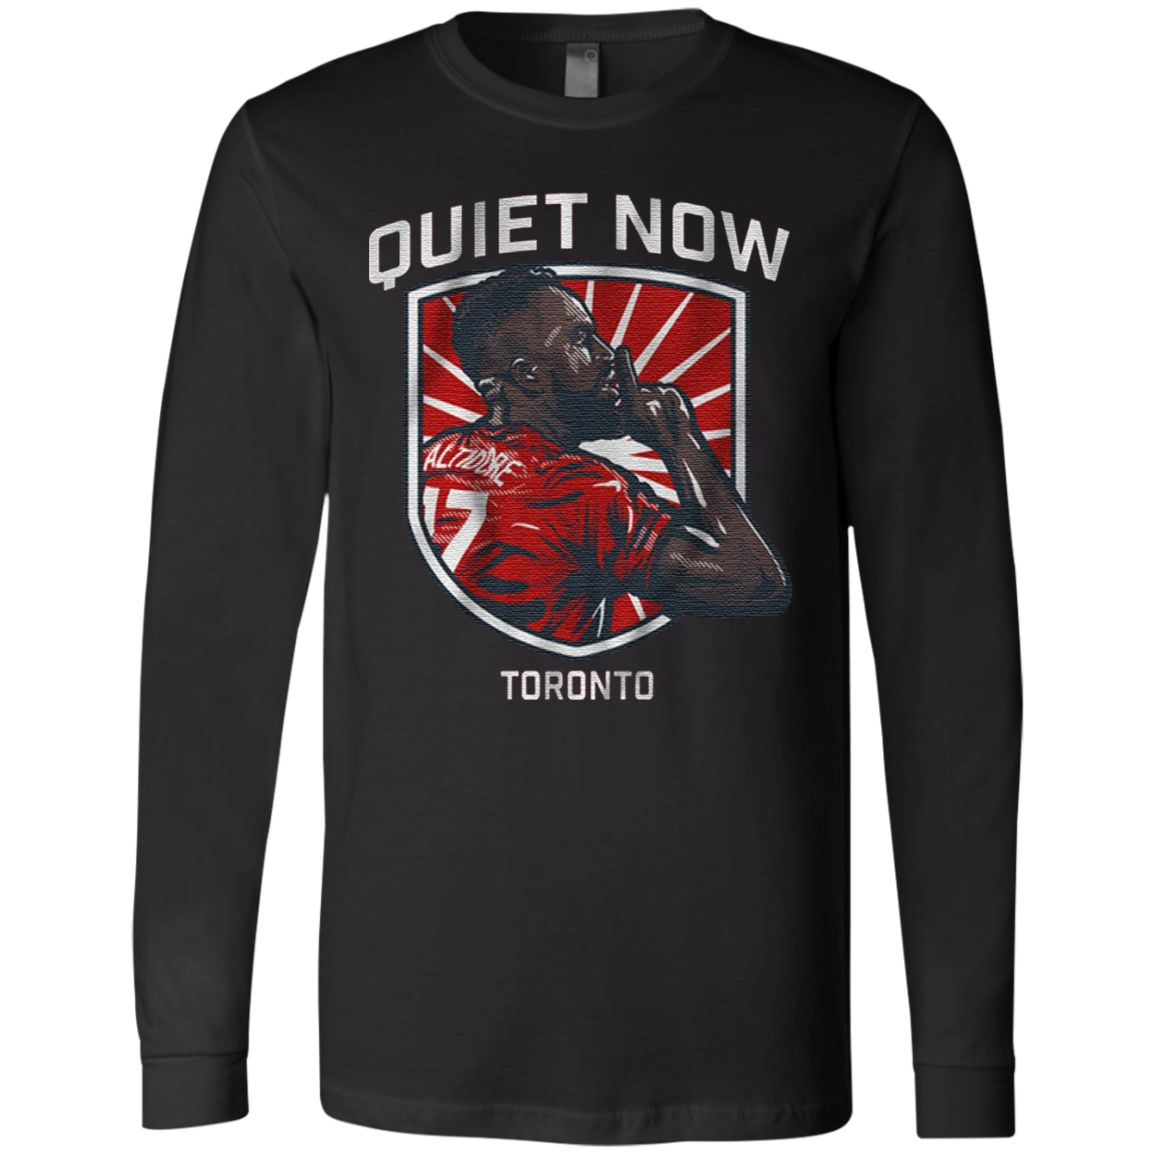 Quiet Now Toronto T Shirt